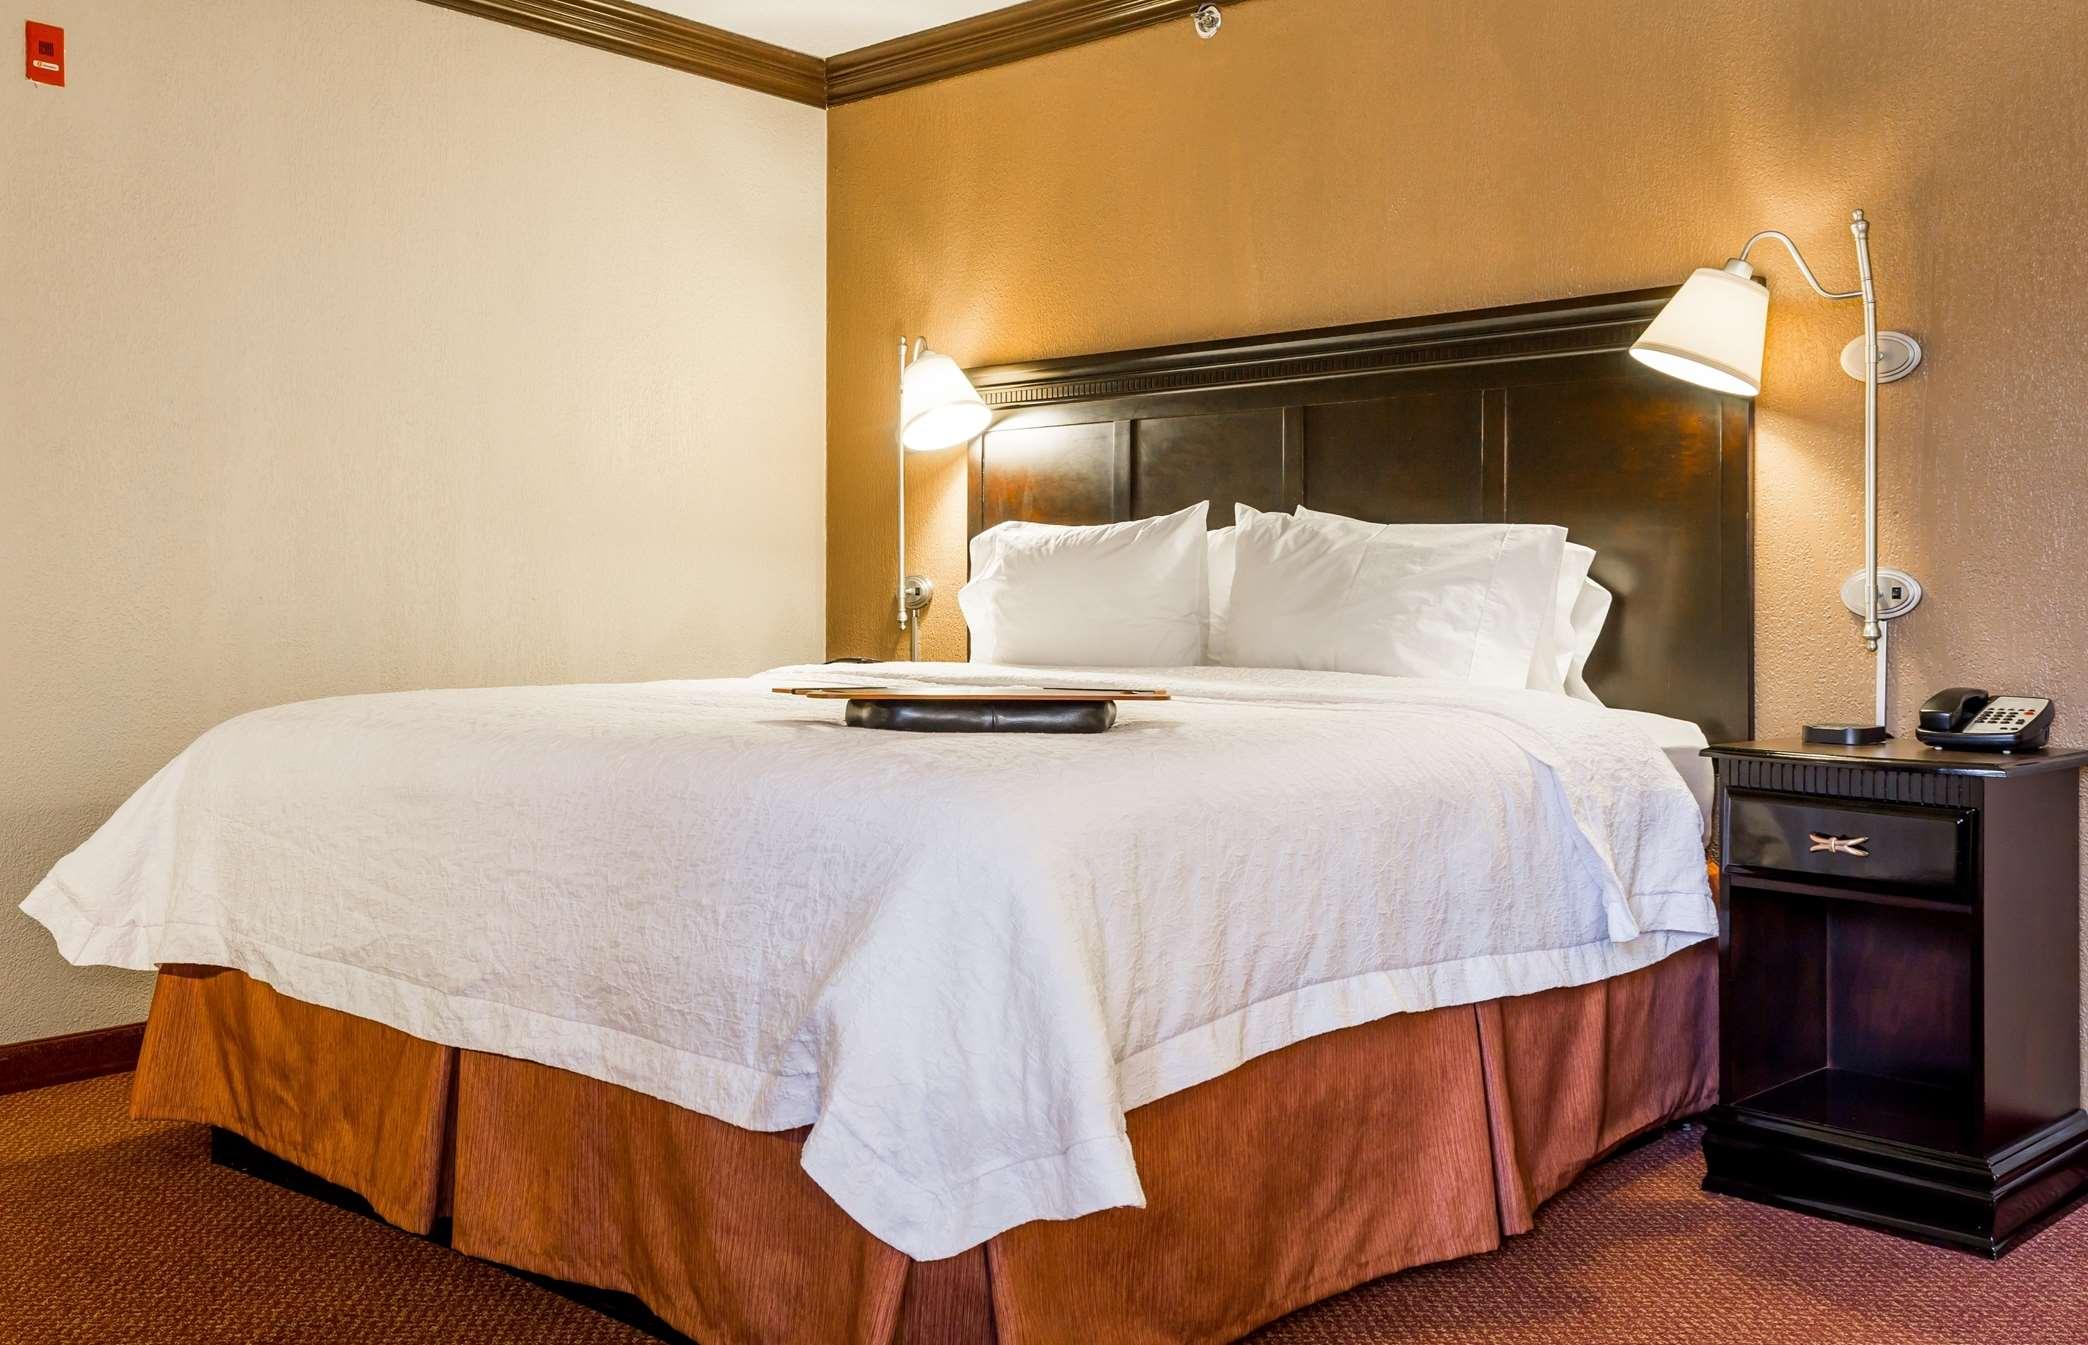 Hampton Inn & Suites Chicago/Hoffman Estates image 44